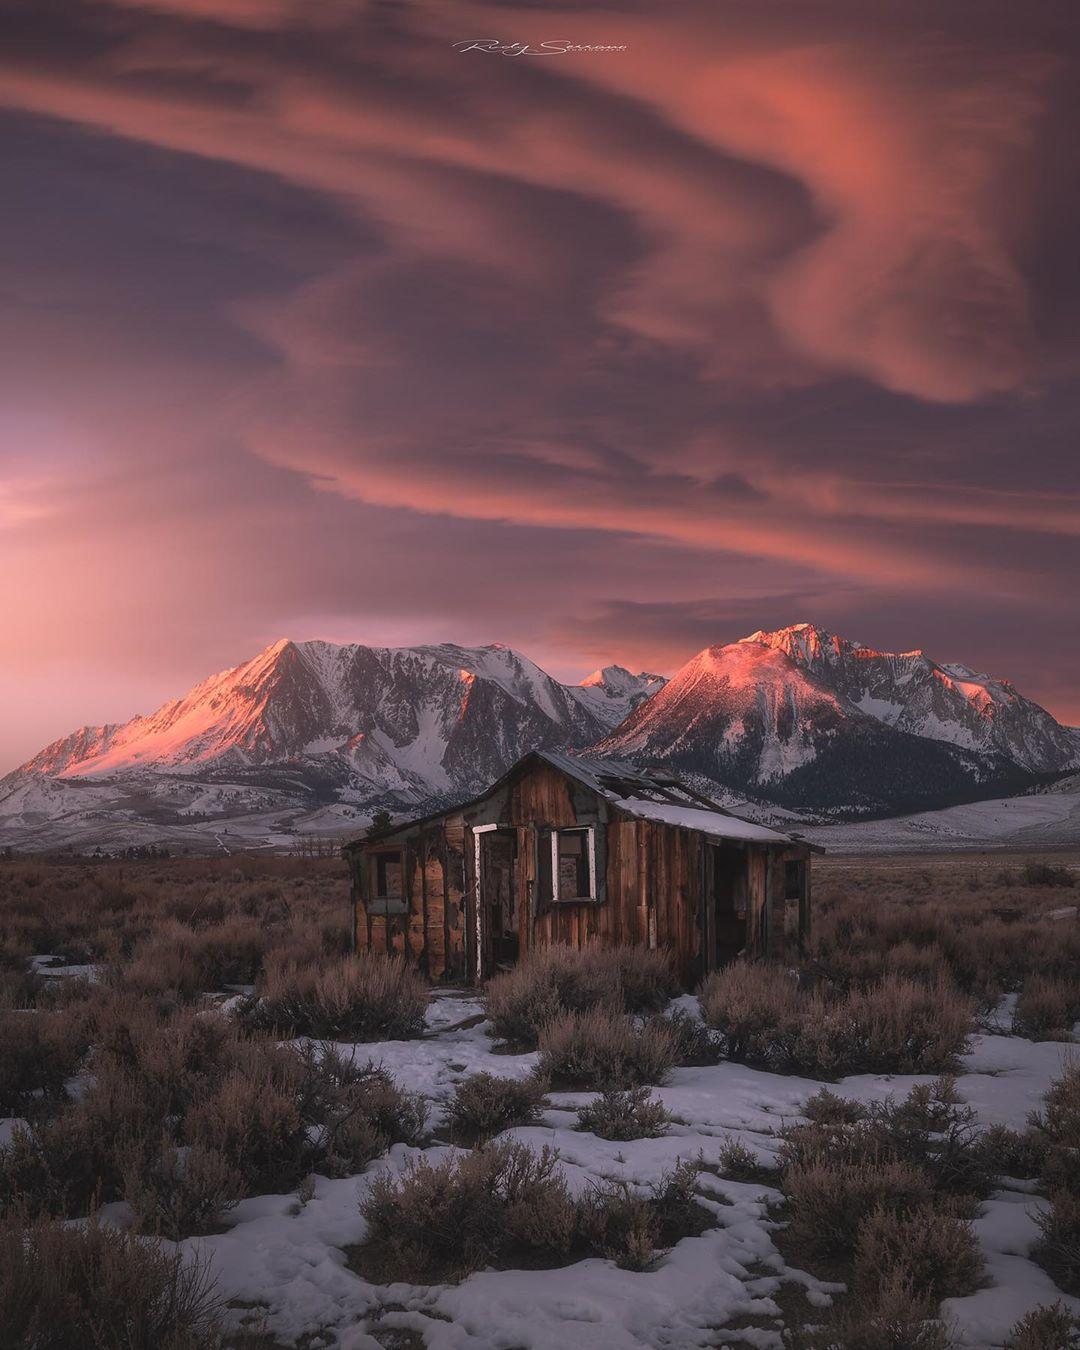 Пейзажи Калифорнии от Руди Серрано